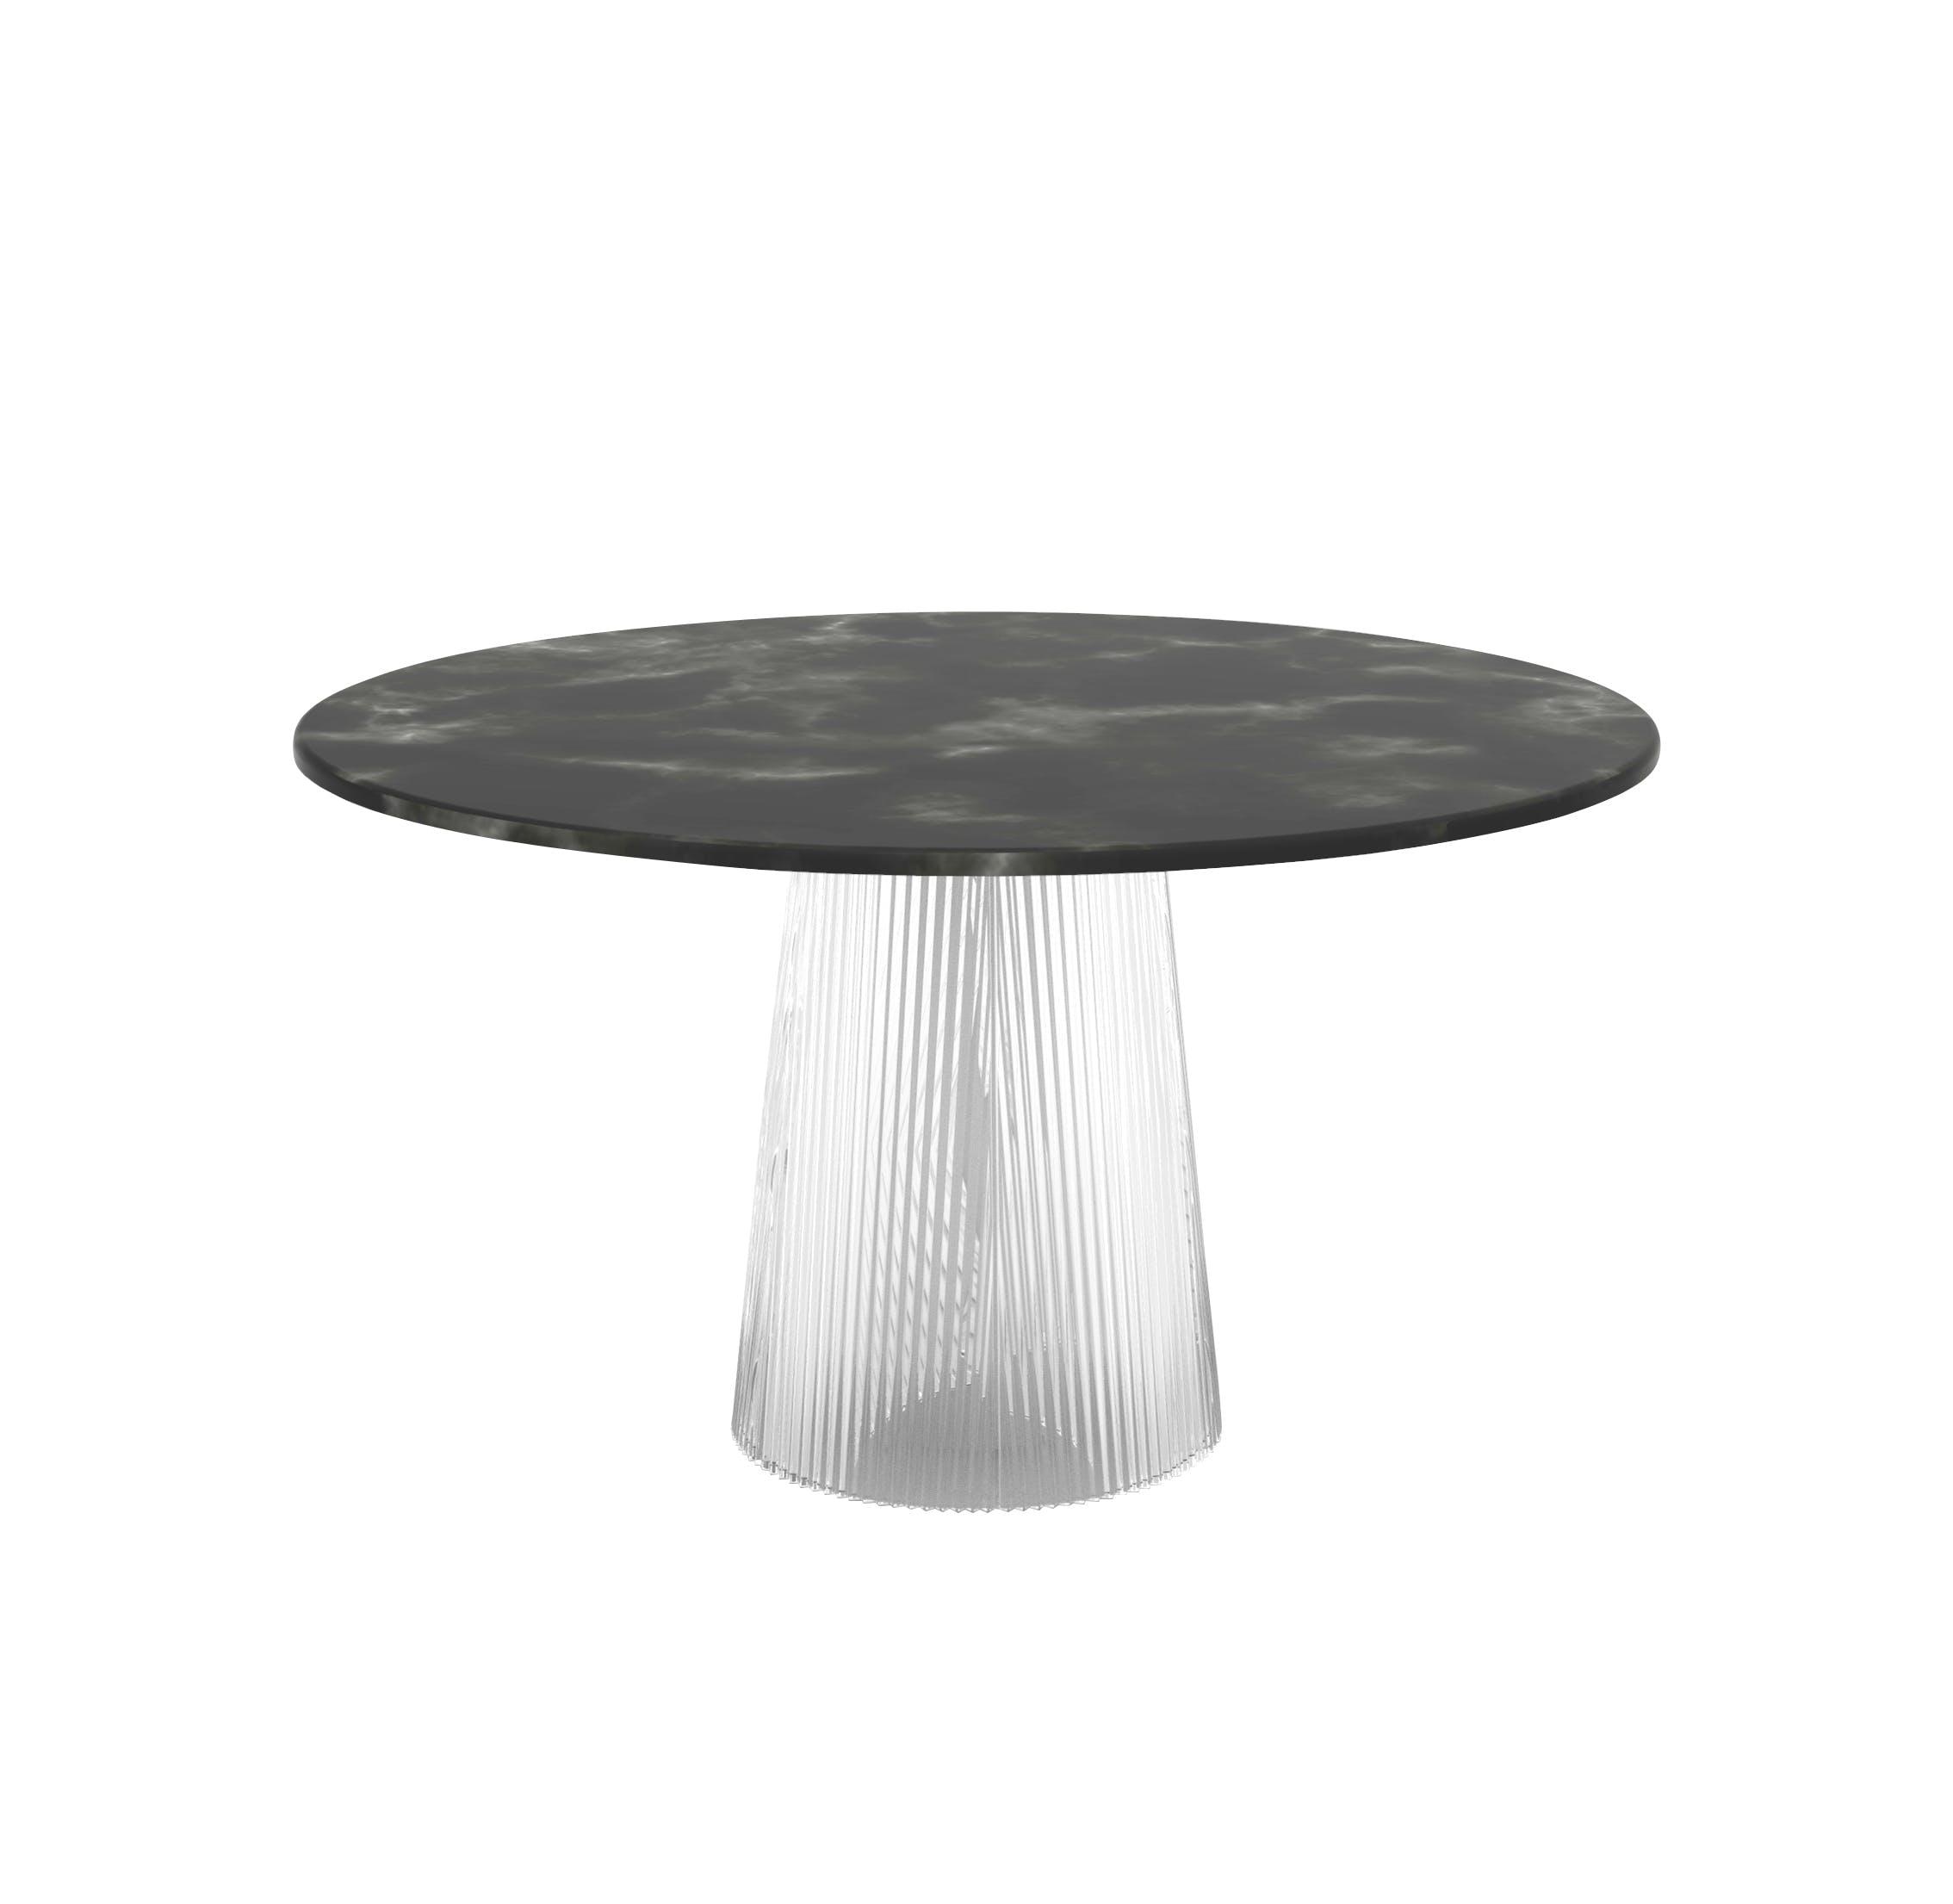 Pulpo-bent-dining-table-black-top-haute-living